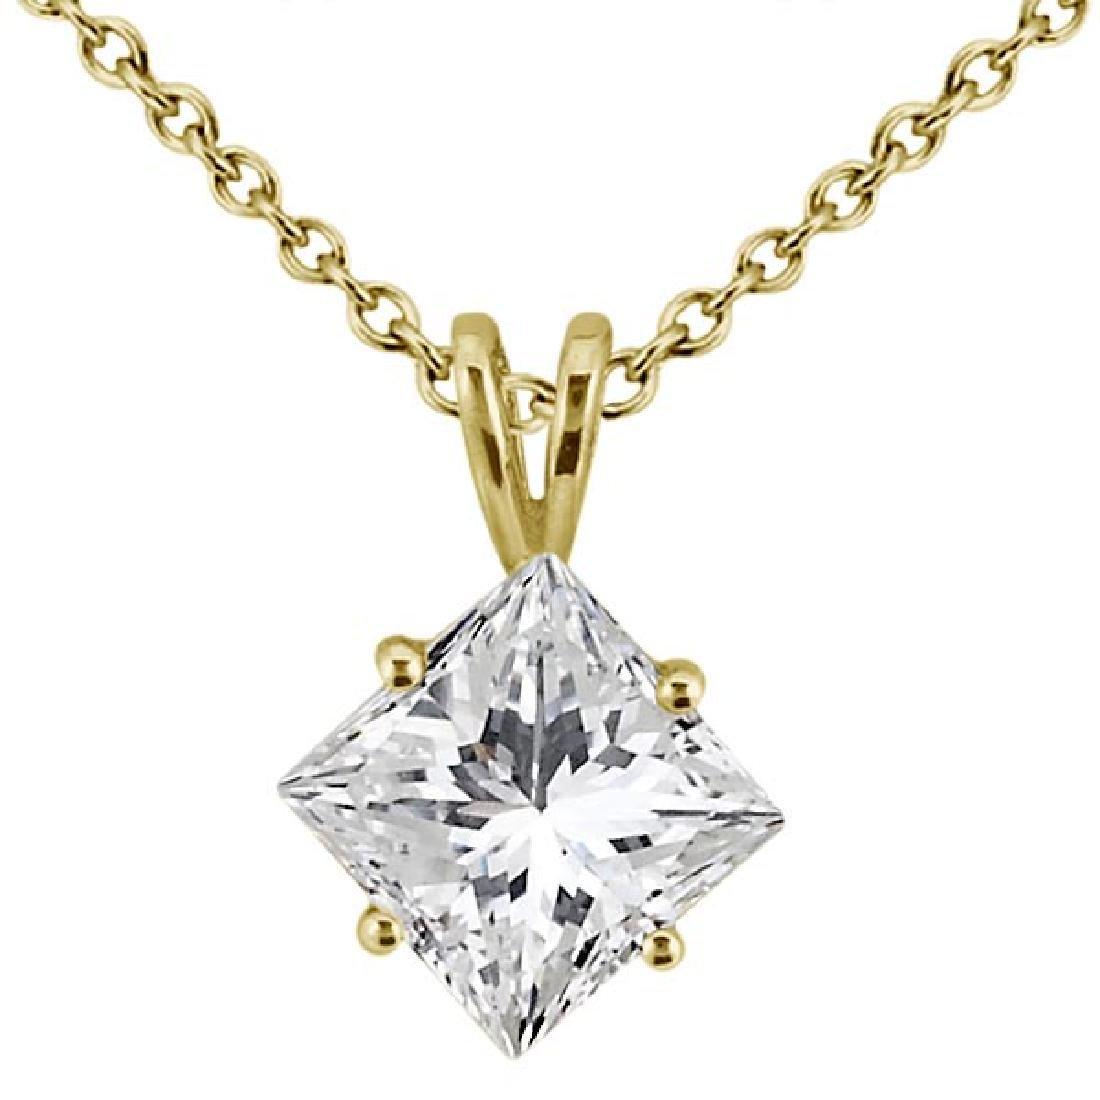 1.00ct. Princess-Cut Diamond Solitaire Pendant in 18k Y